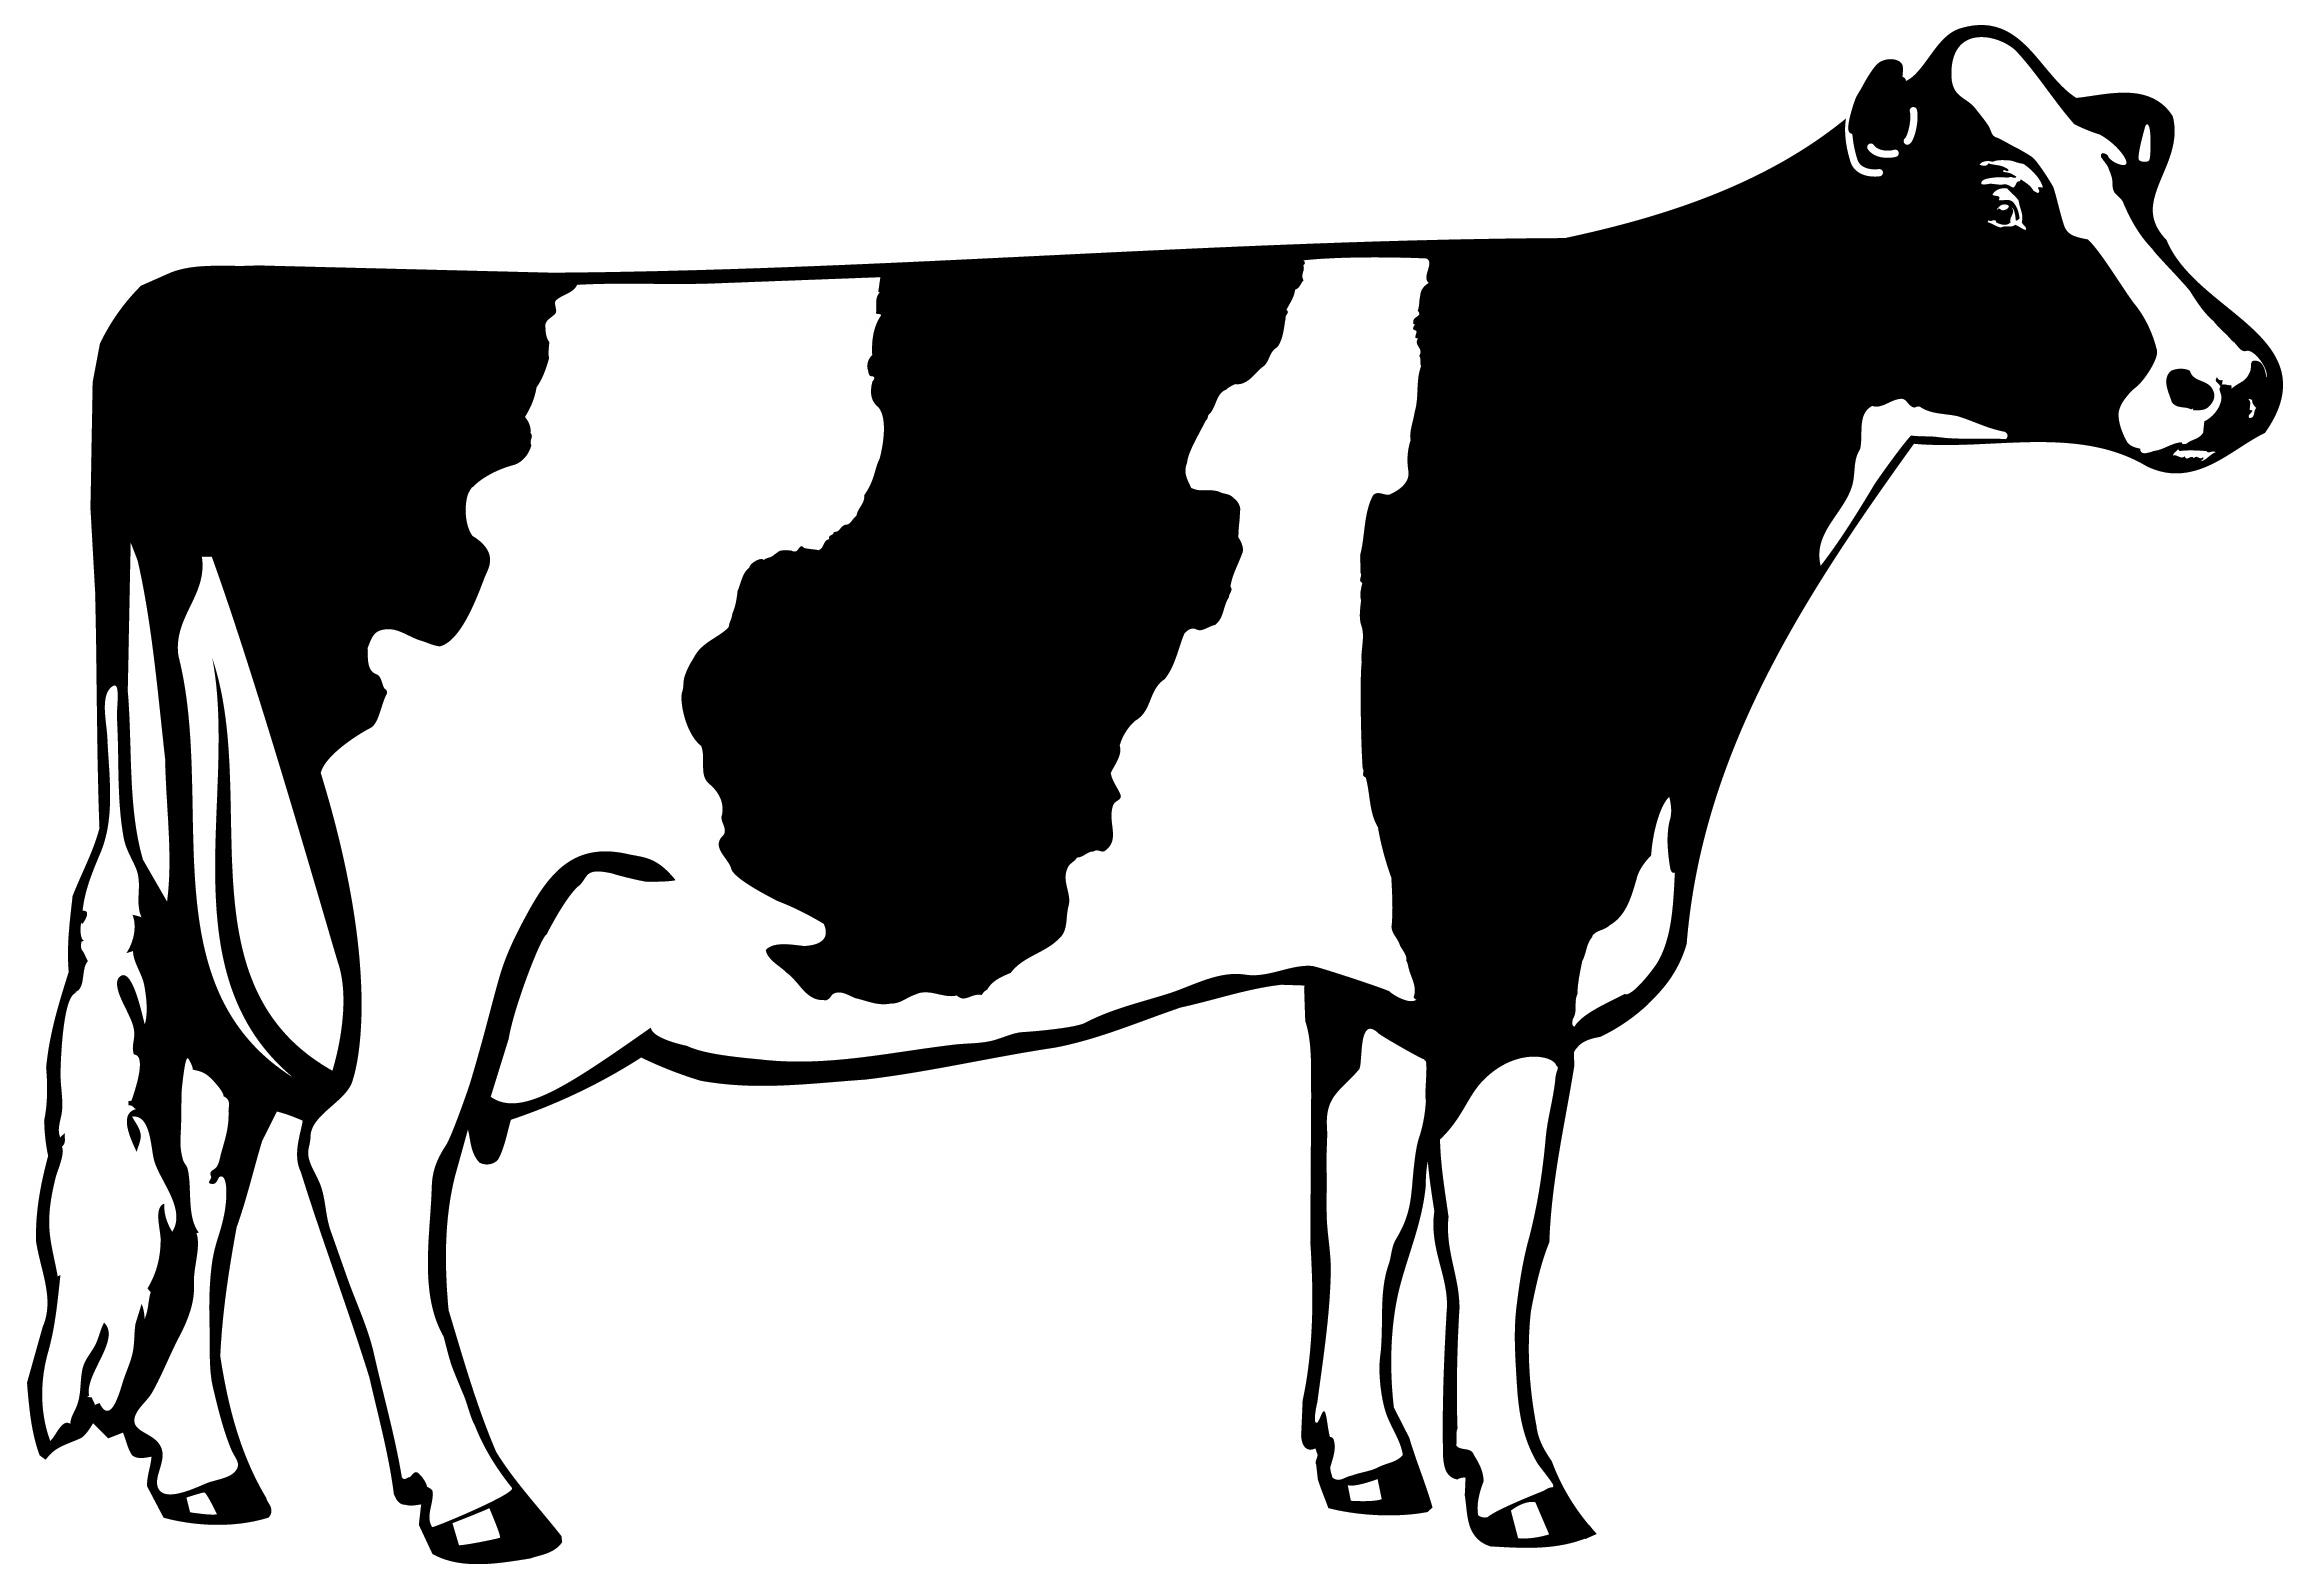 Cow Silhouette Clip Art-cow silhouette clip art-10